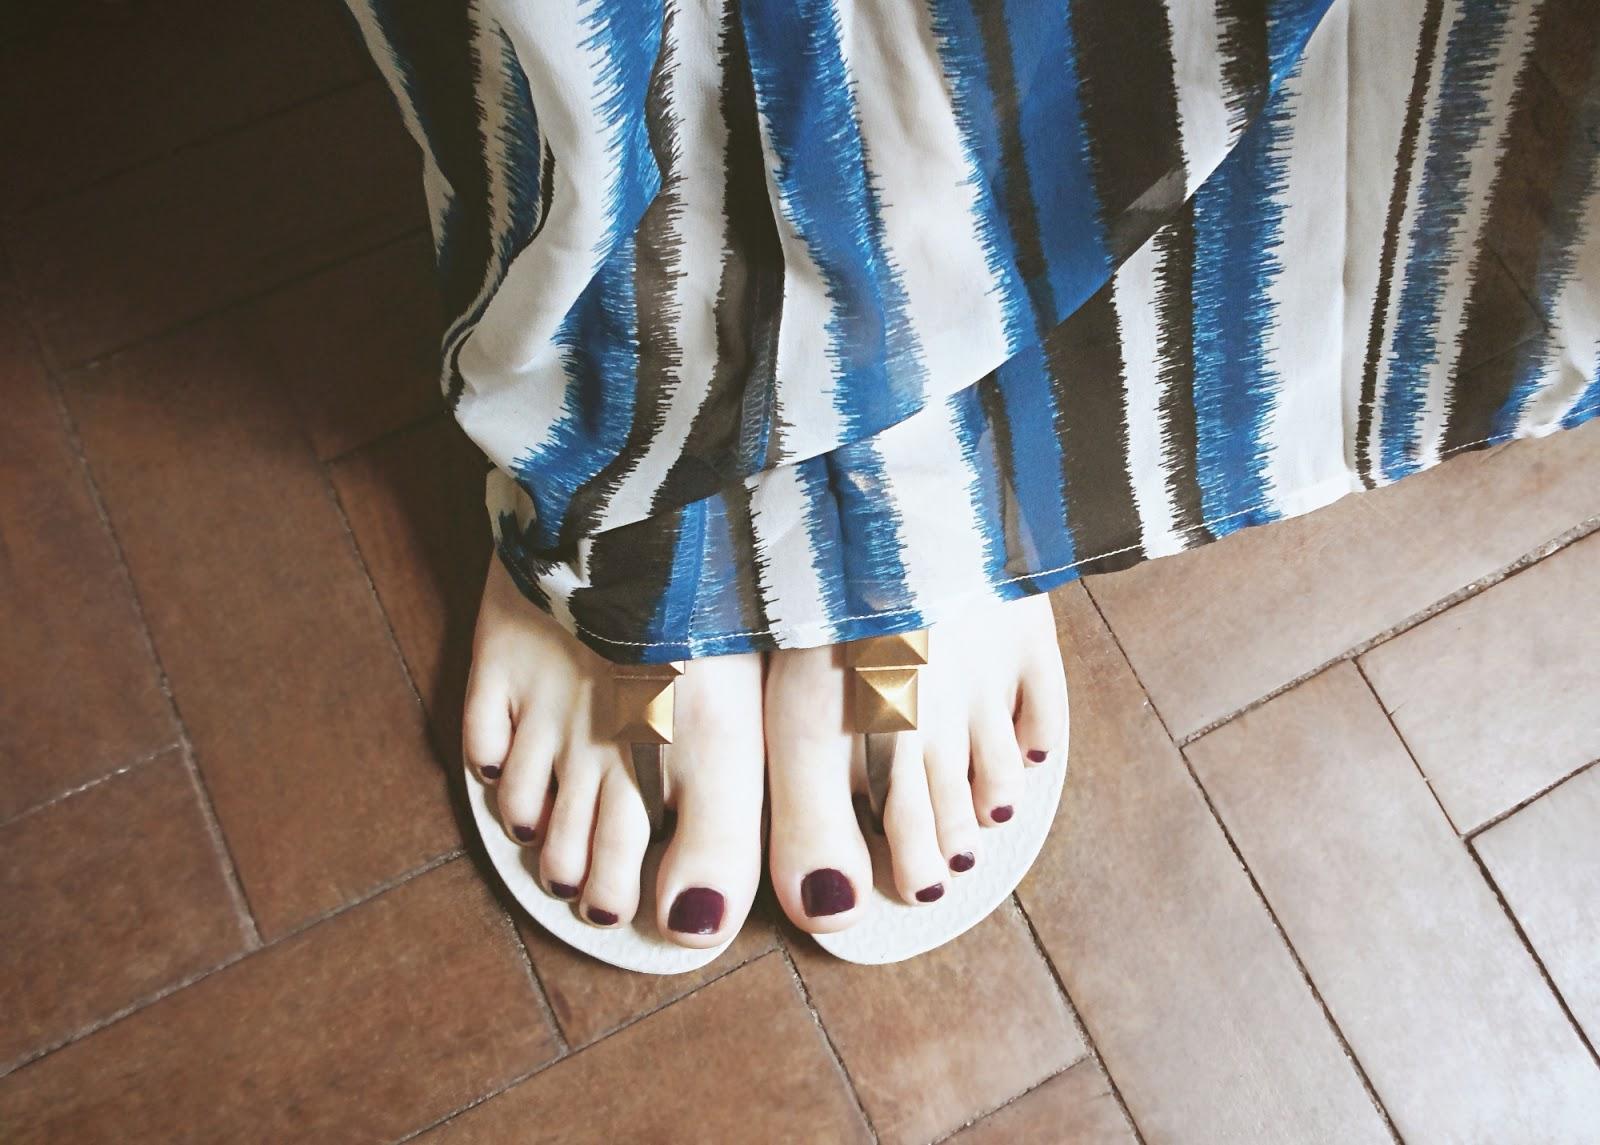 ipanema brazil shoes sandals flip flops ootd outfit liz breygel pictures